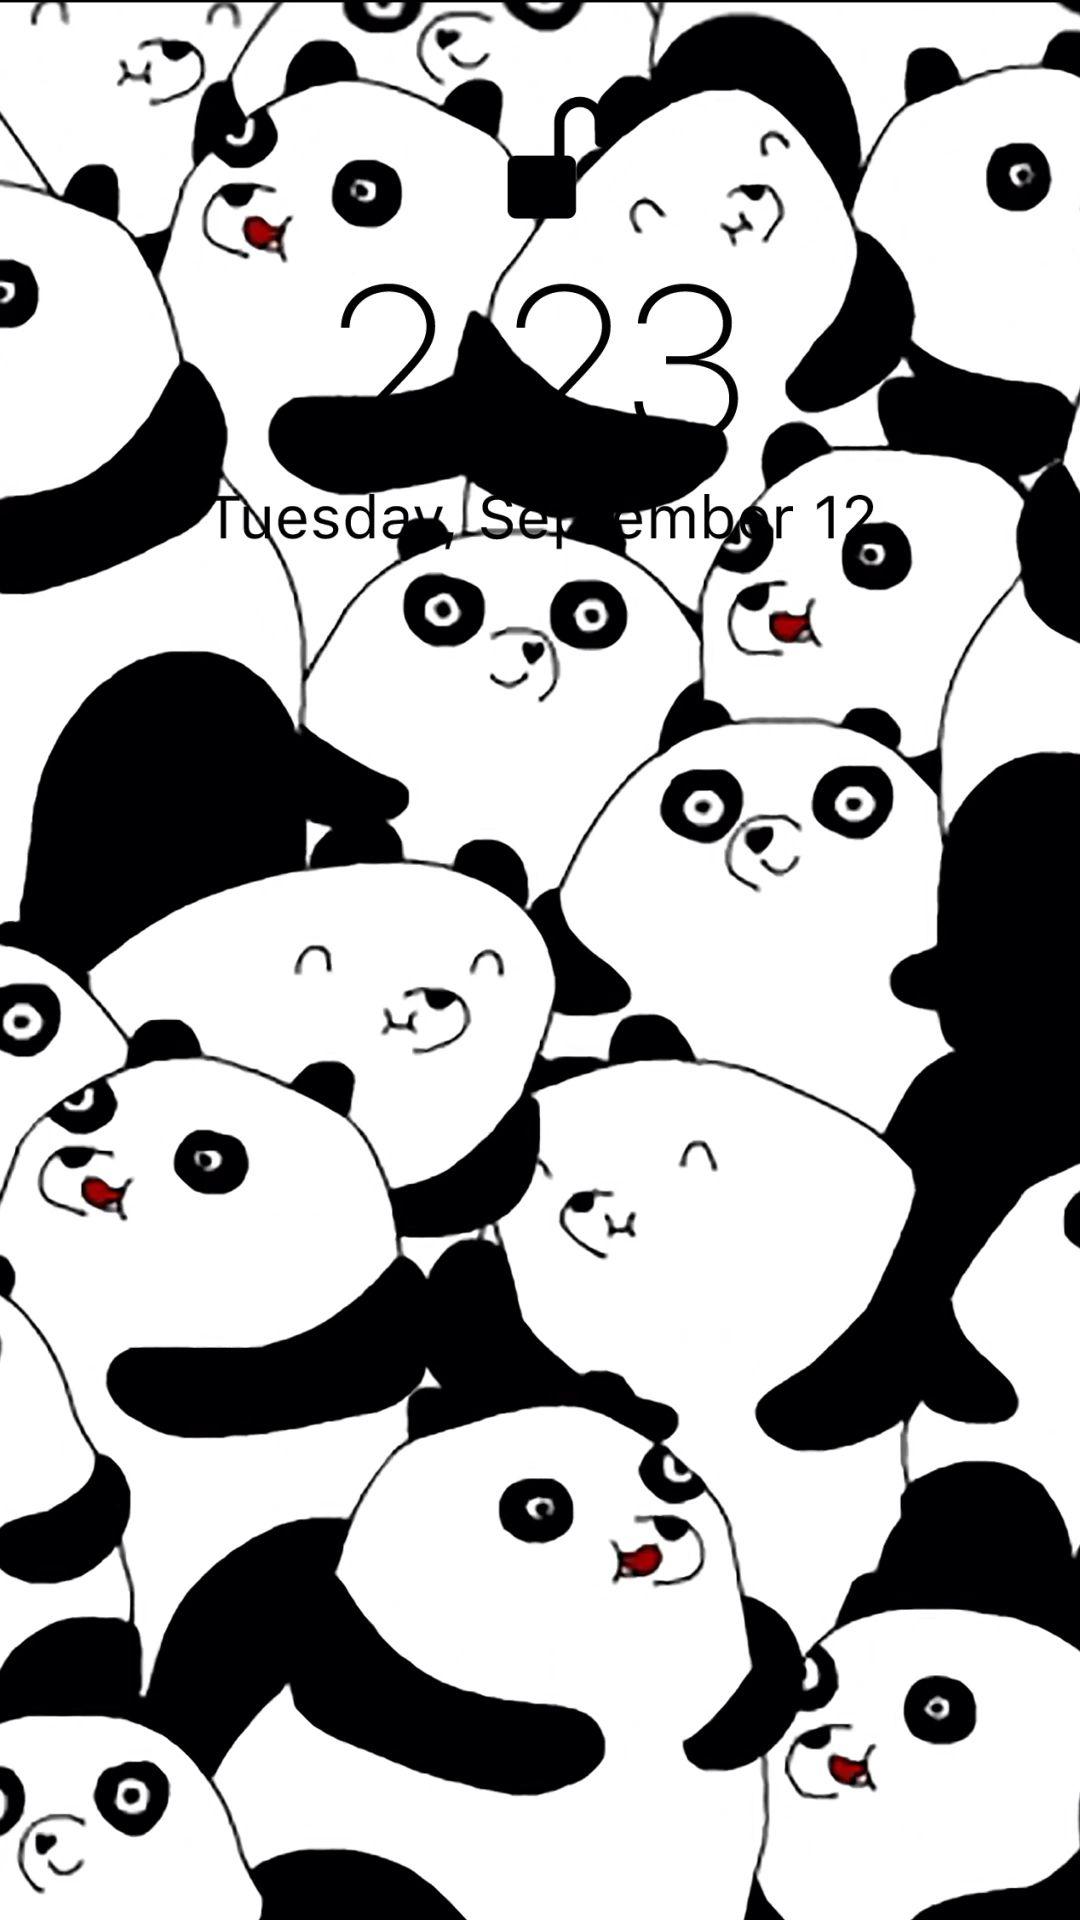 Cute Animated Panda Gif 1080x1920 Wallpaper Teahub Io